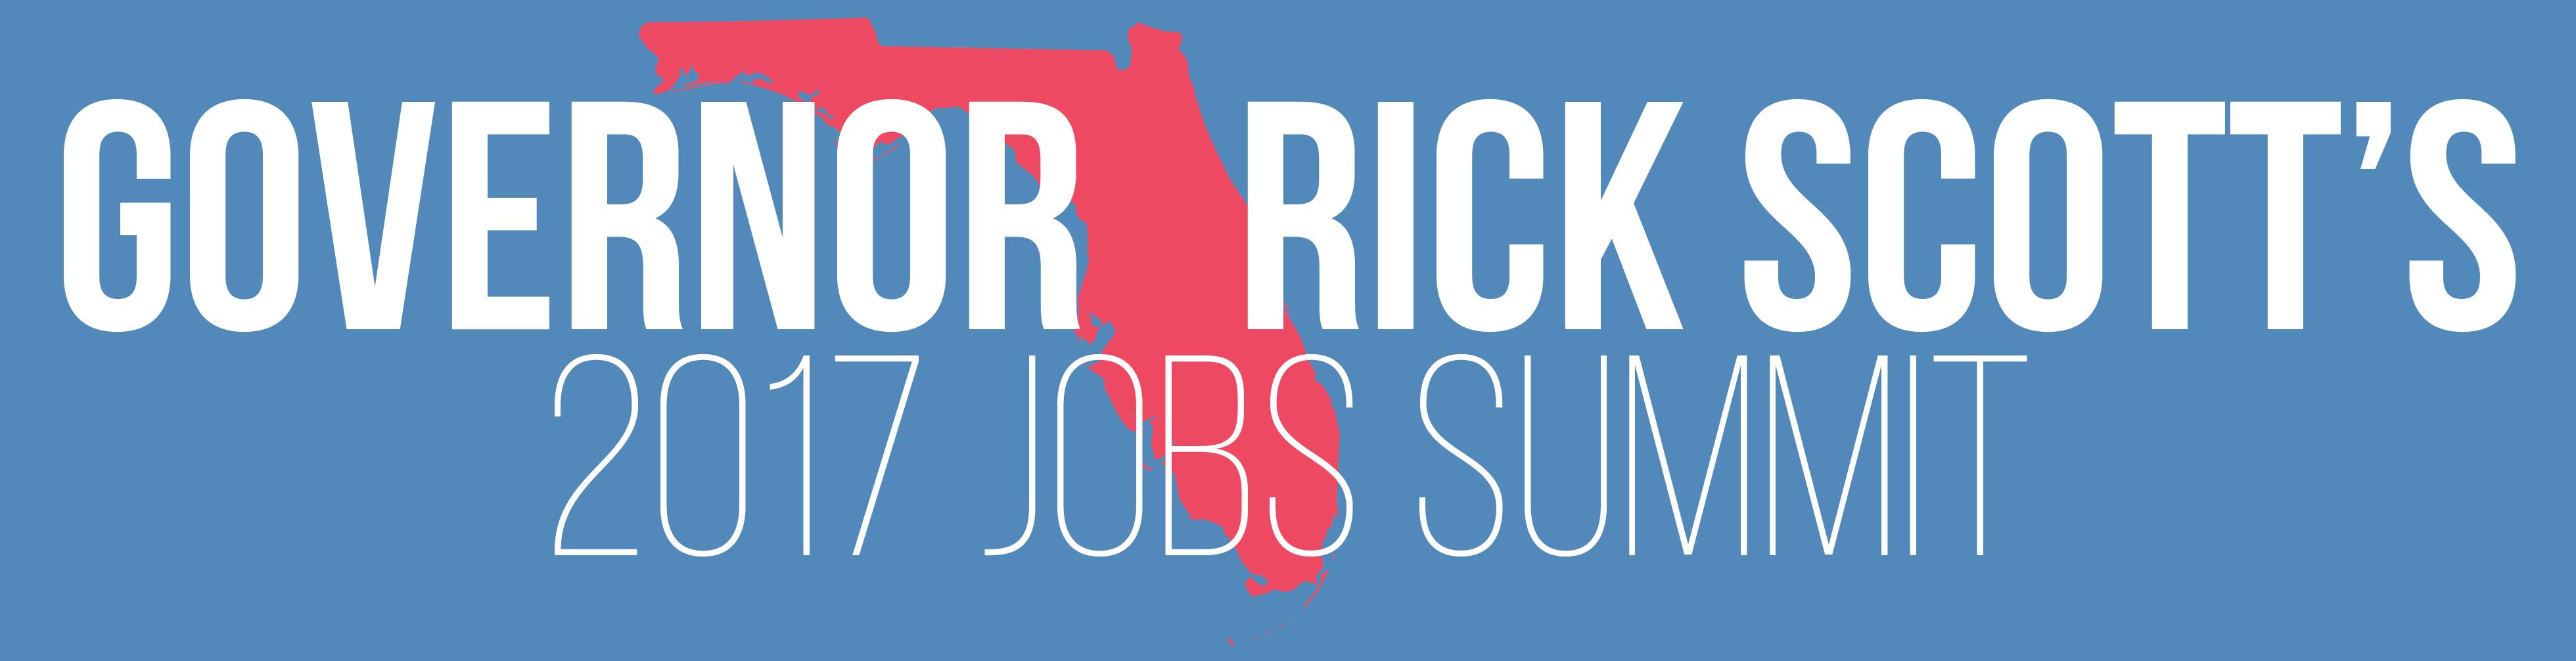 Governor Rick Scott's 2017 Jobs Summit